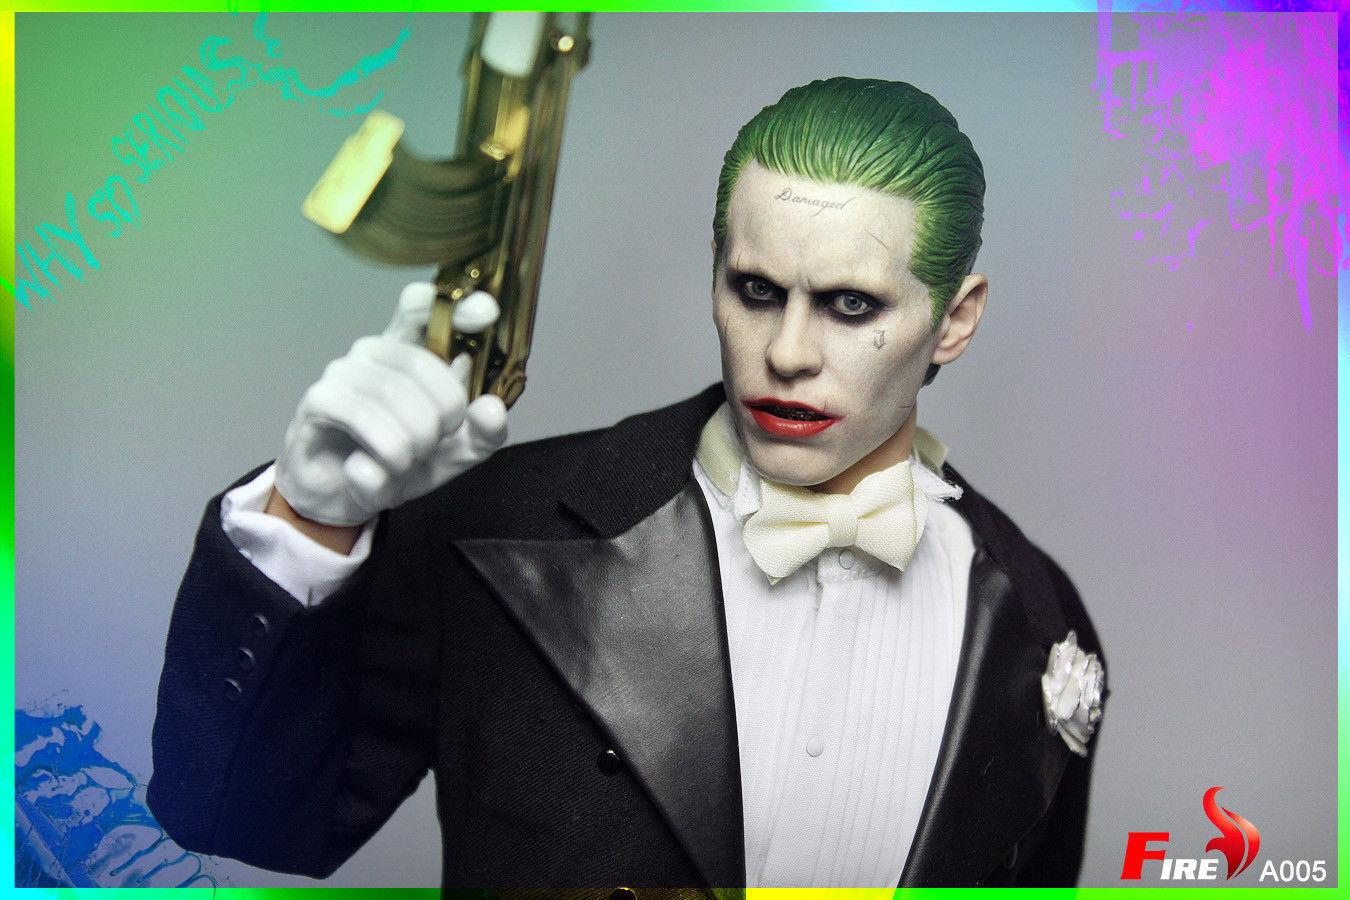 FIRE 1 6 Joker Jared Leto Head Sculpt&Tuxedo Clothes Set A005 F 12'' Male Figure